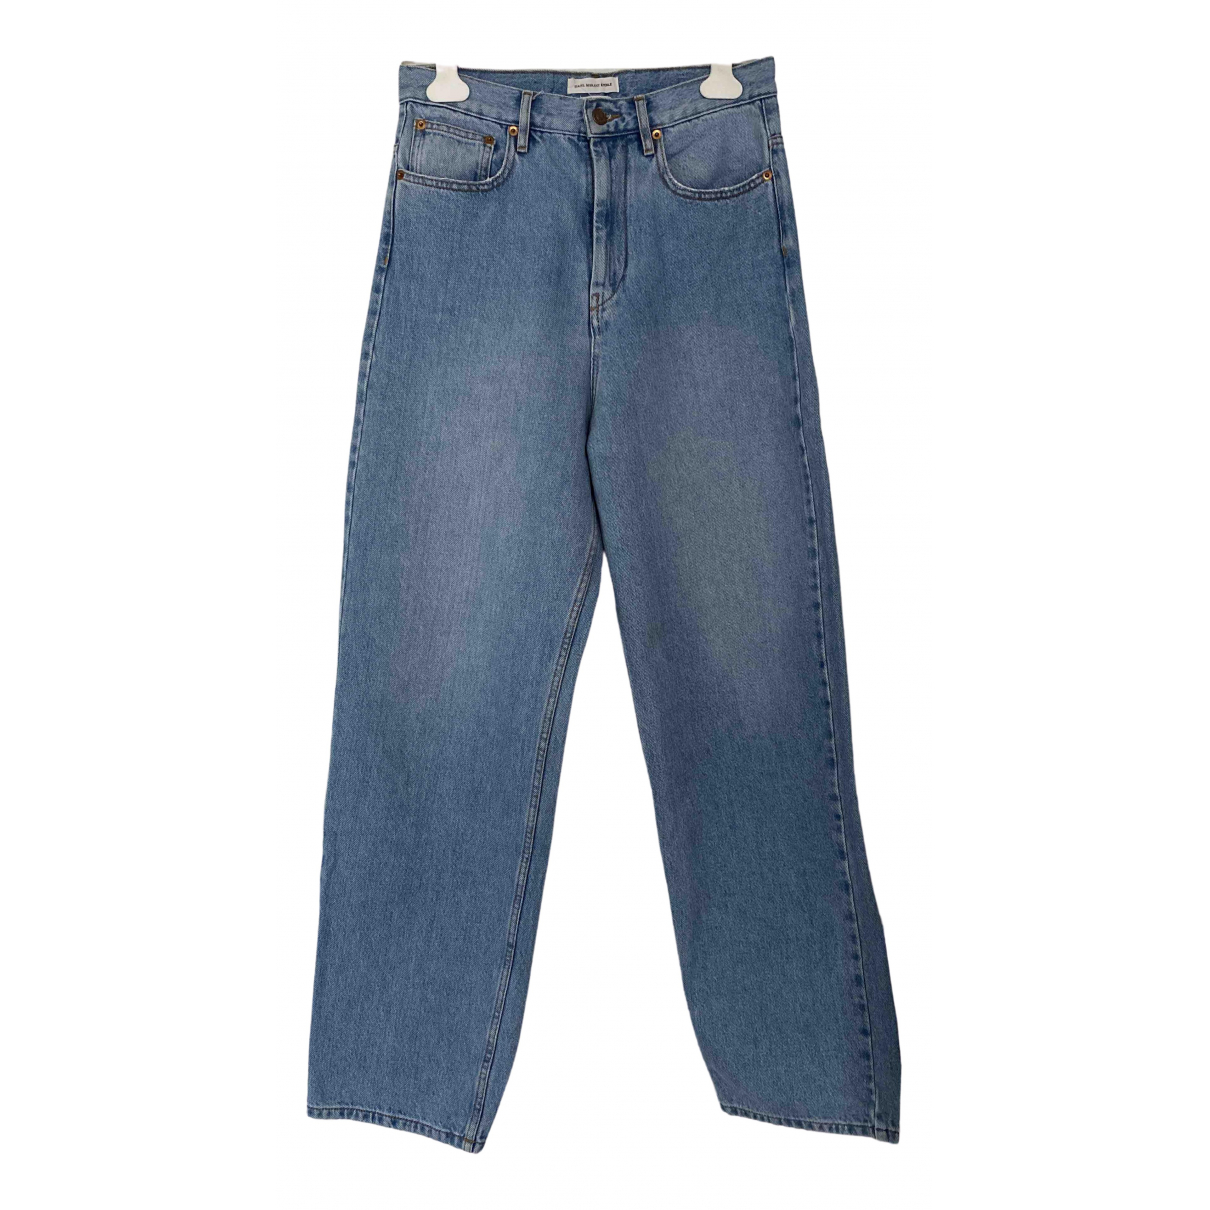 Isabel Marant Etoile \N Blue Cotton Jeans for Women 36 FR